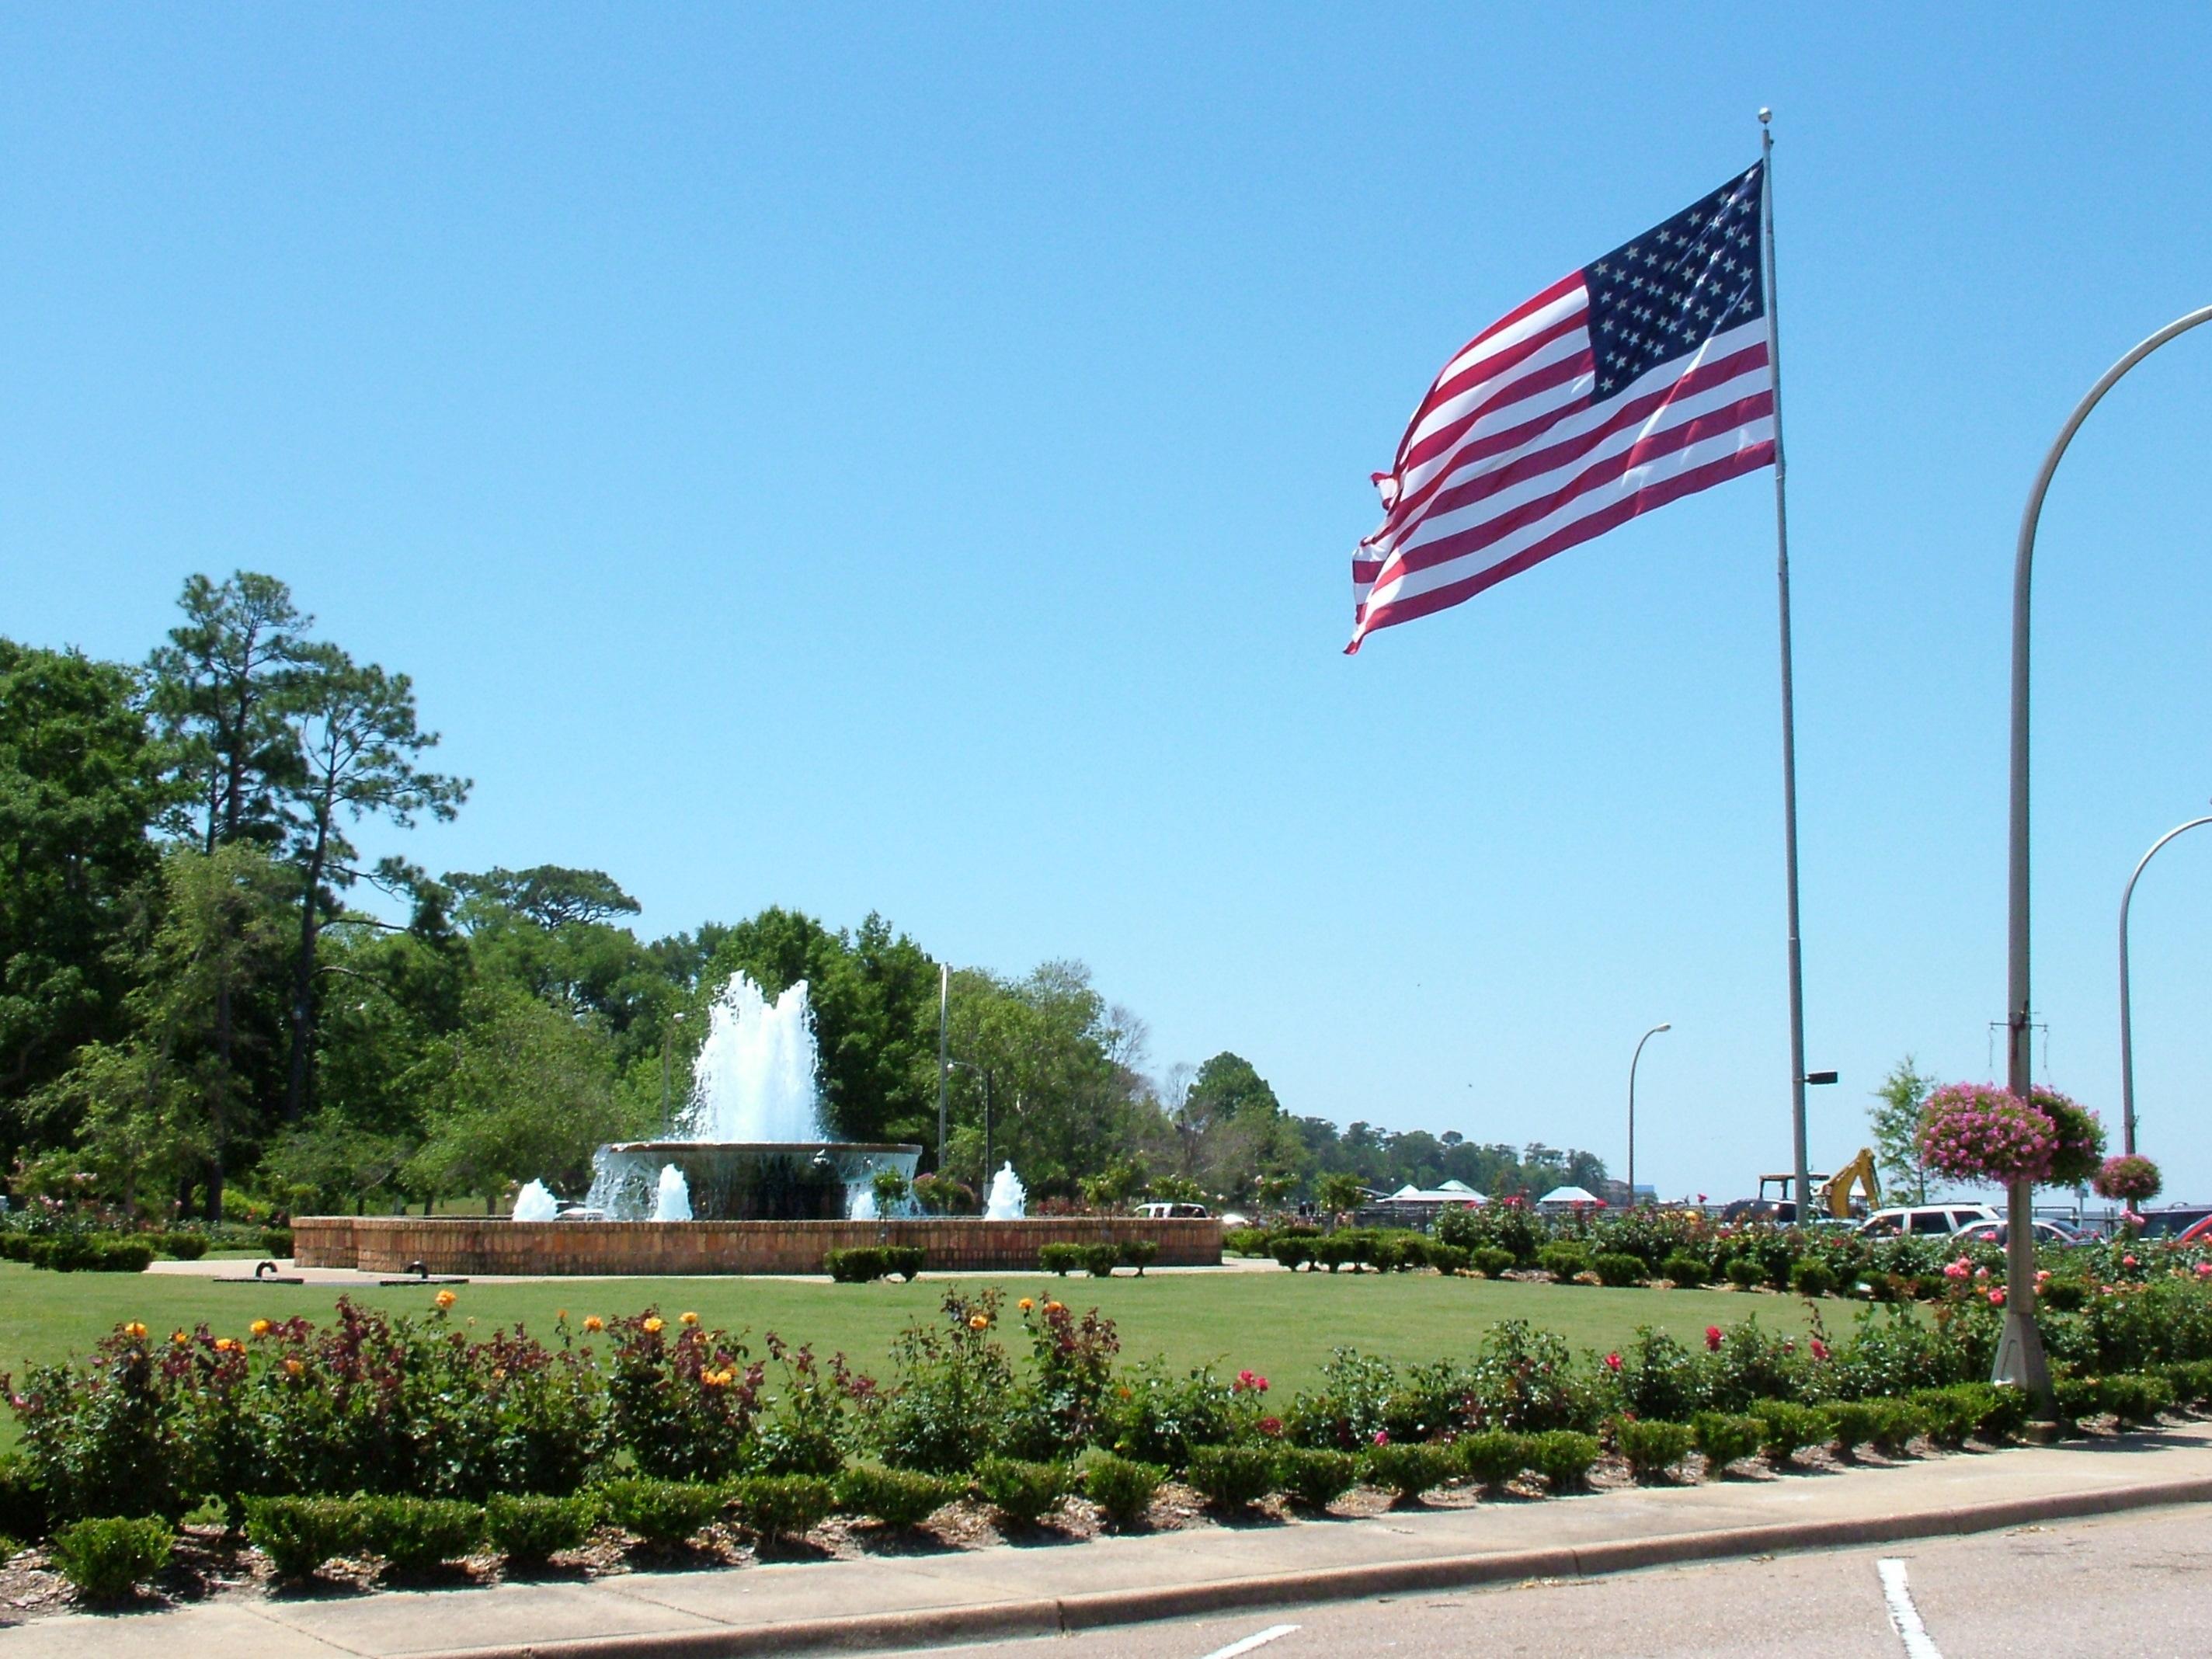 Fountain at the Municipal Pier